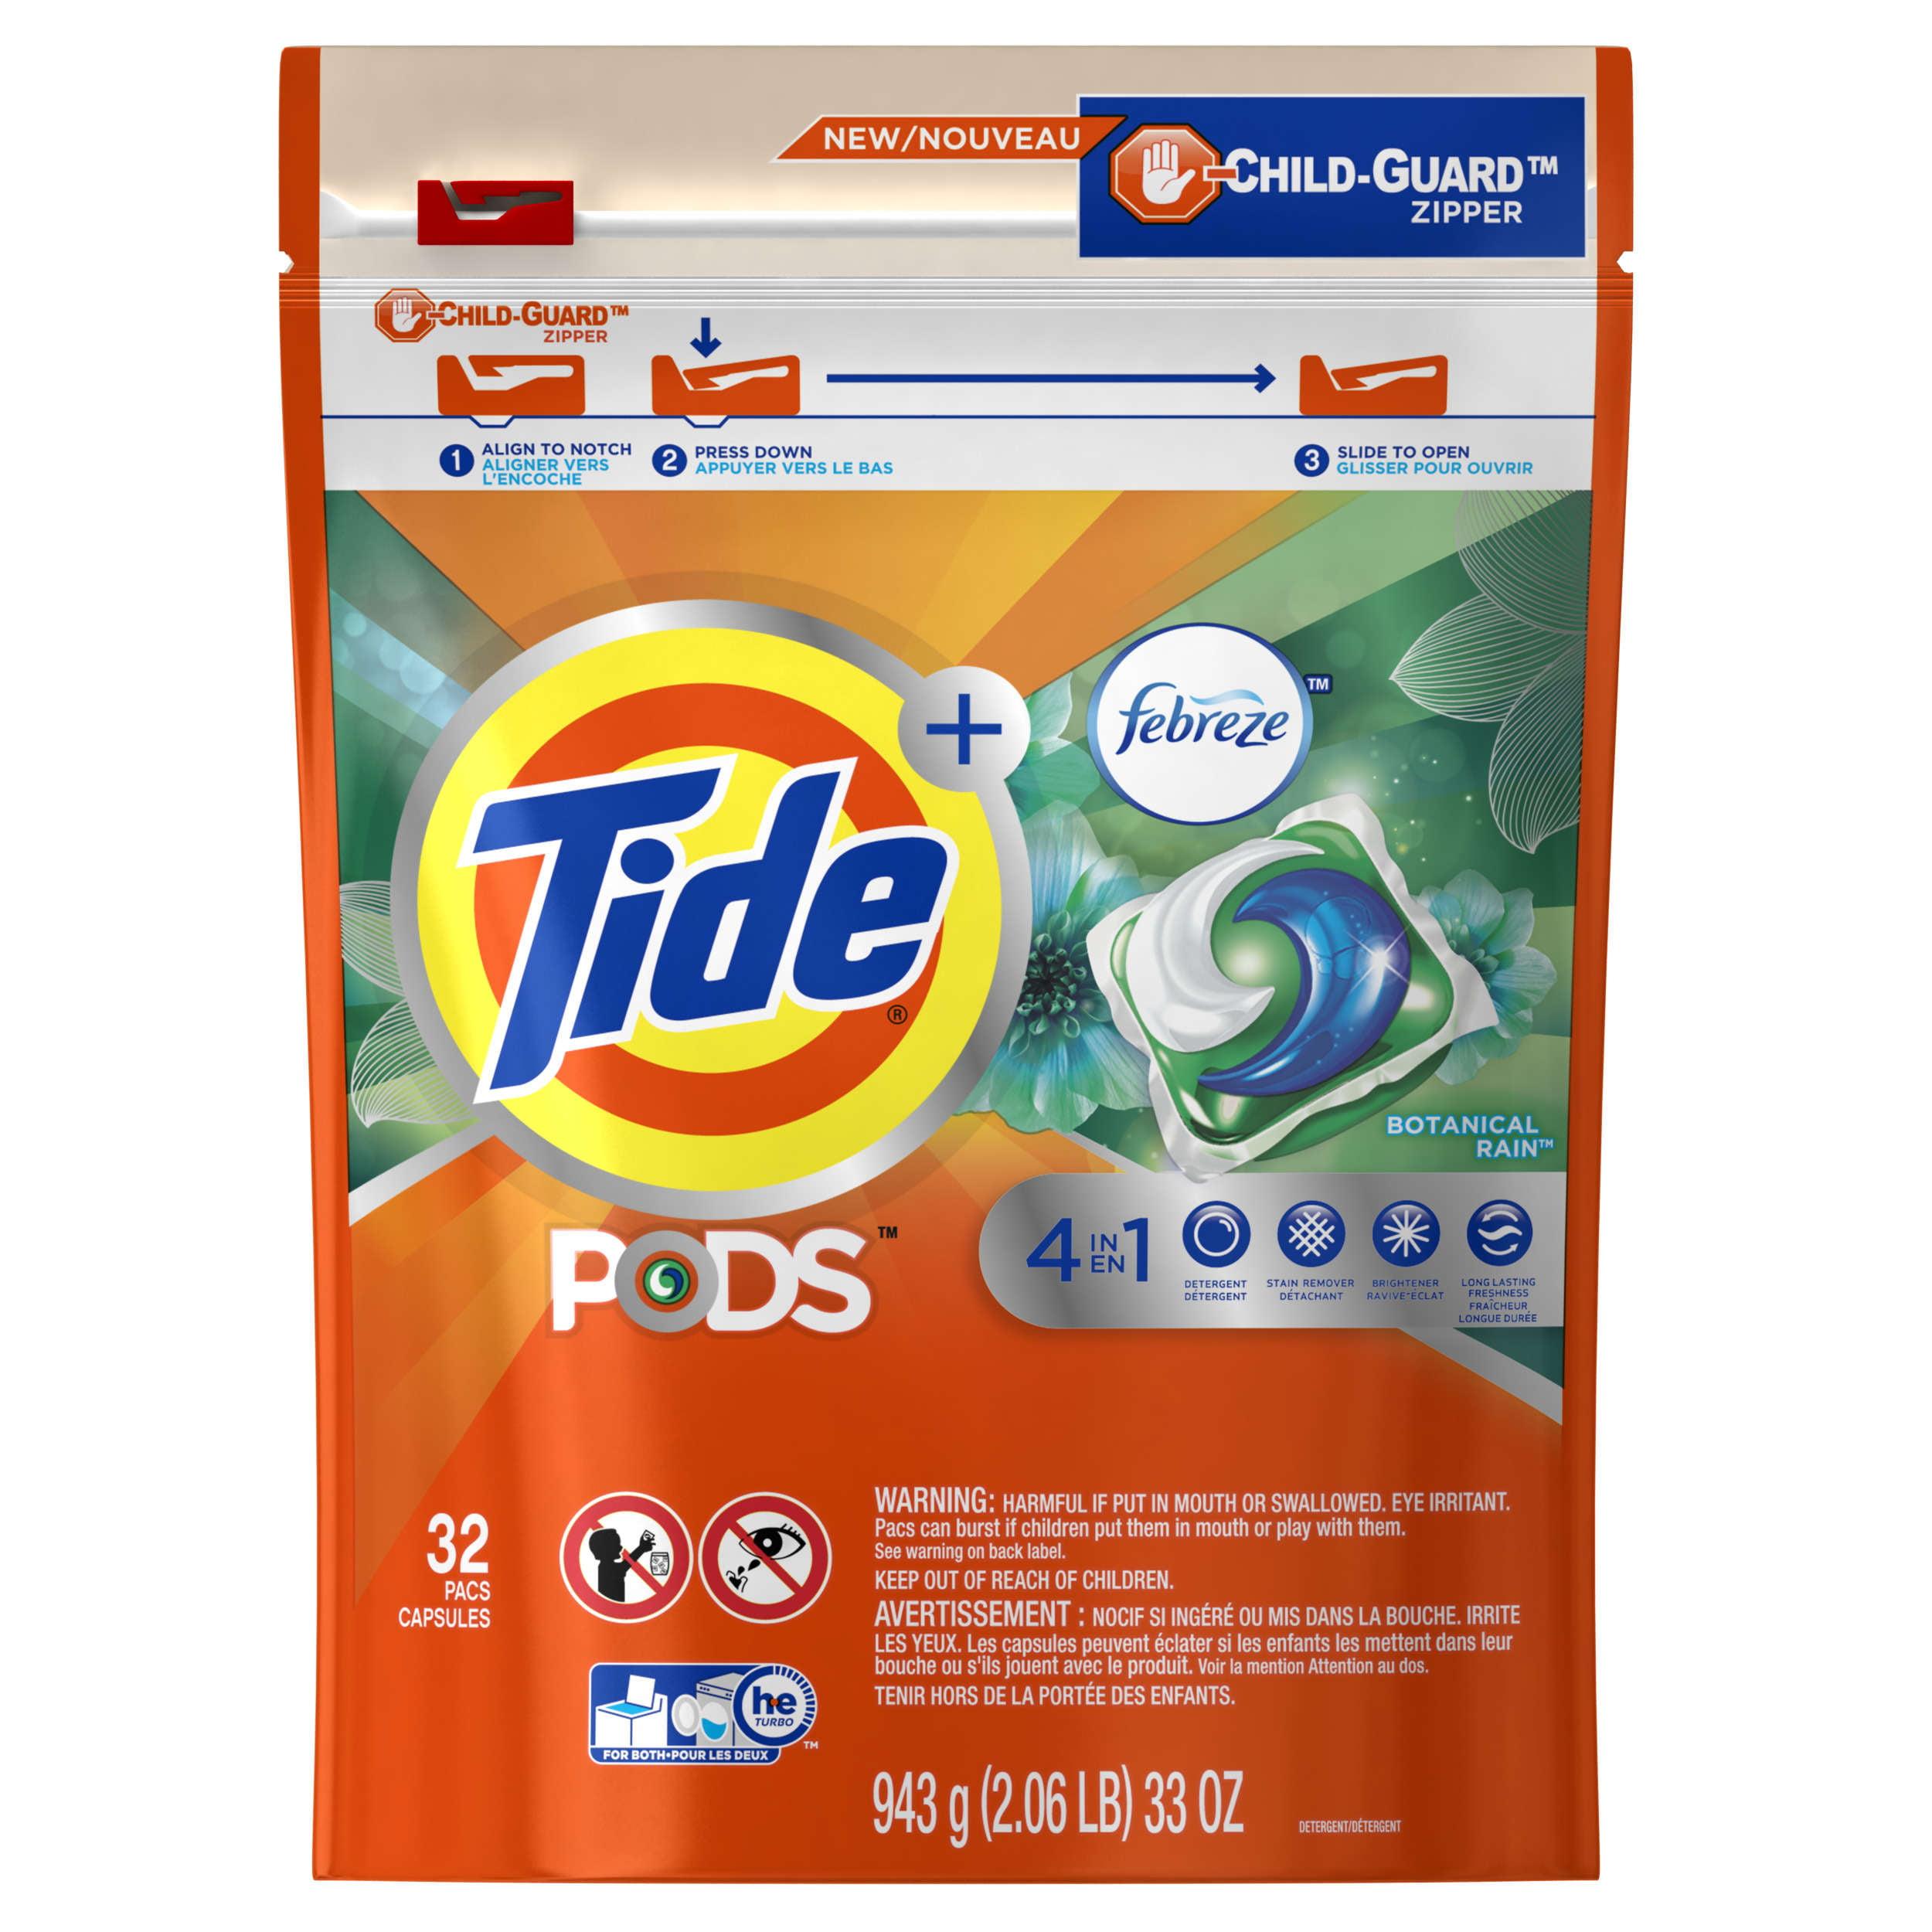 Tide PODS Laundry Detergent with Febreze, Botanical Rain, 32 count